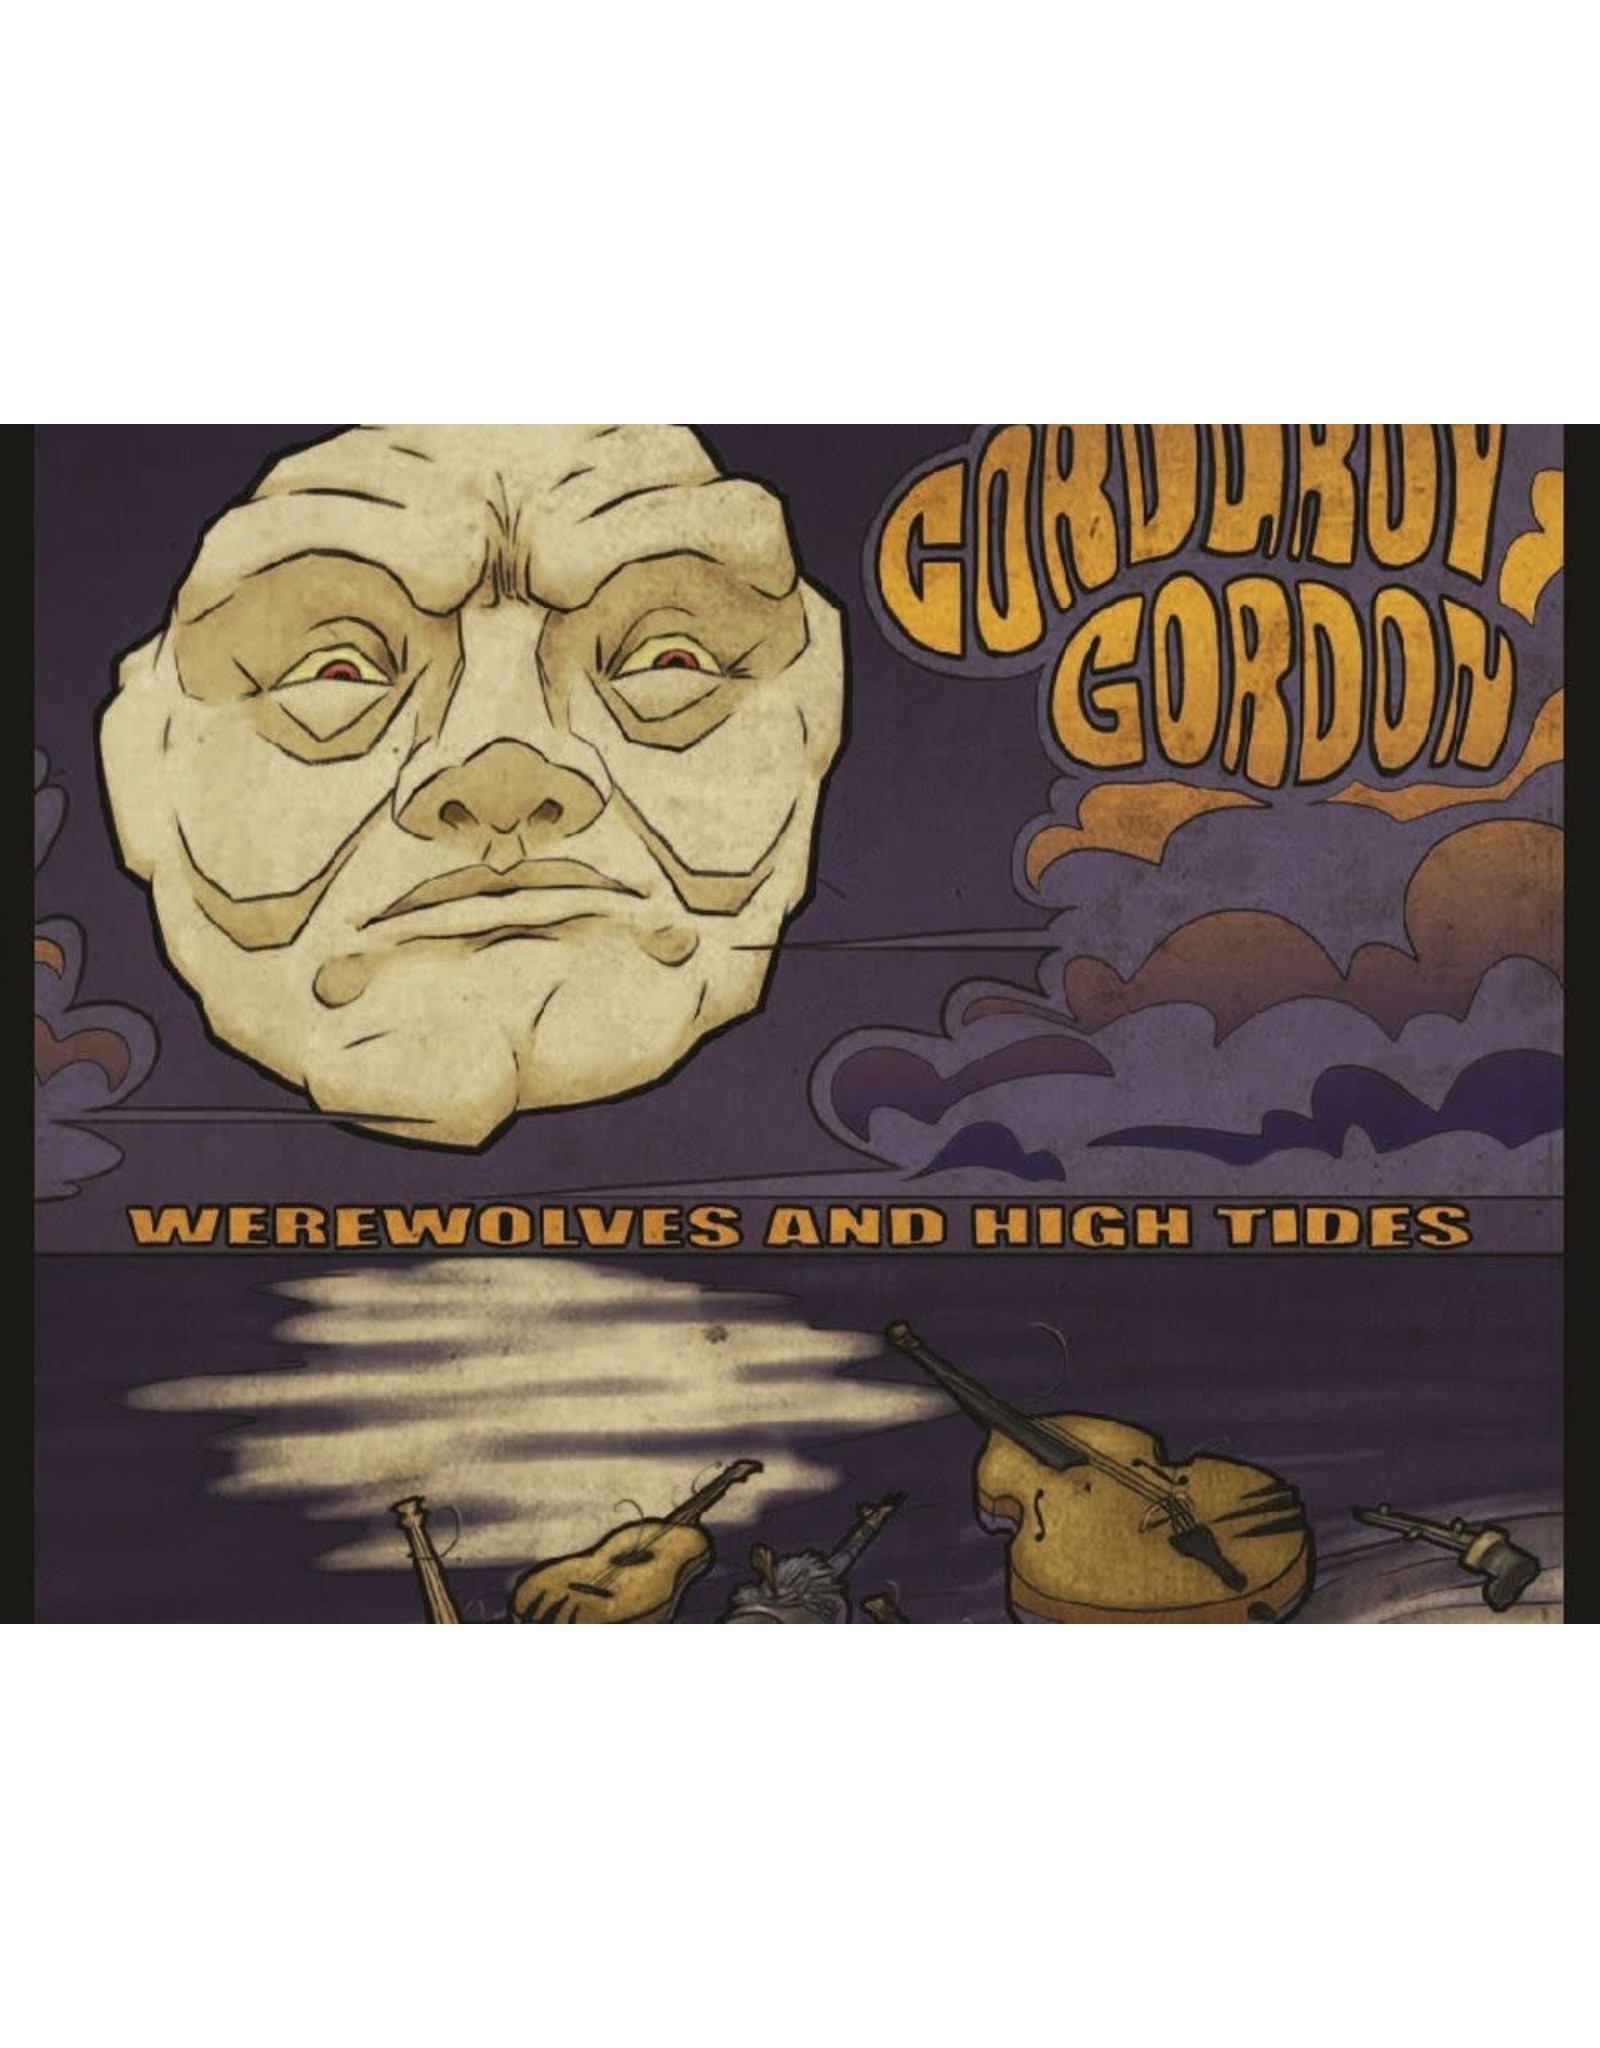 Corduroy Gordon - Werewolves and High Tides CD